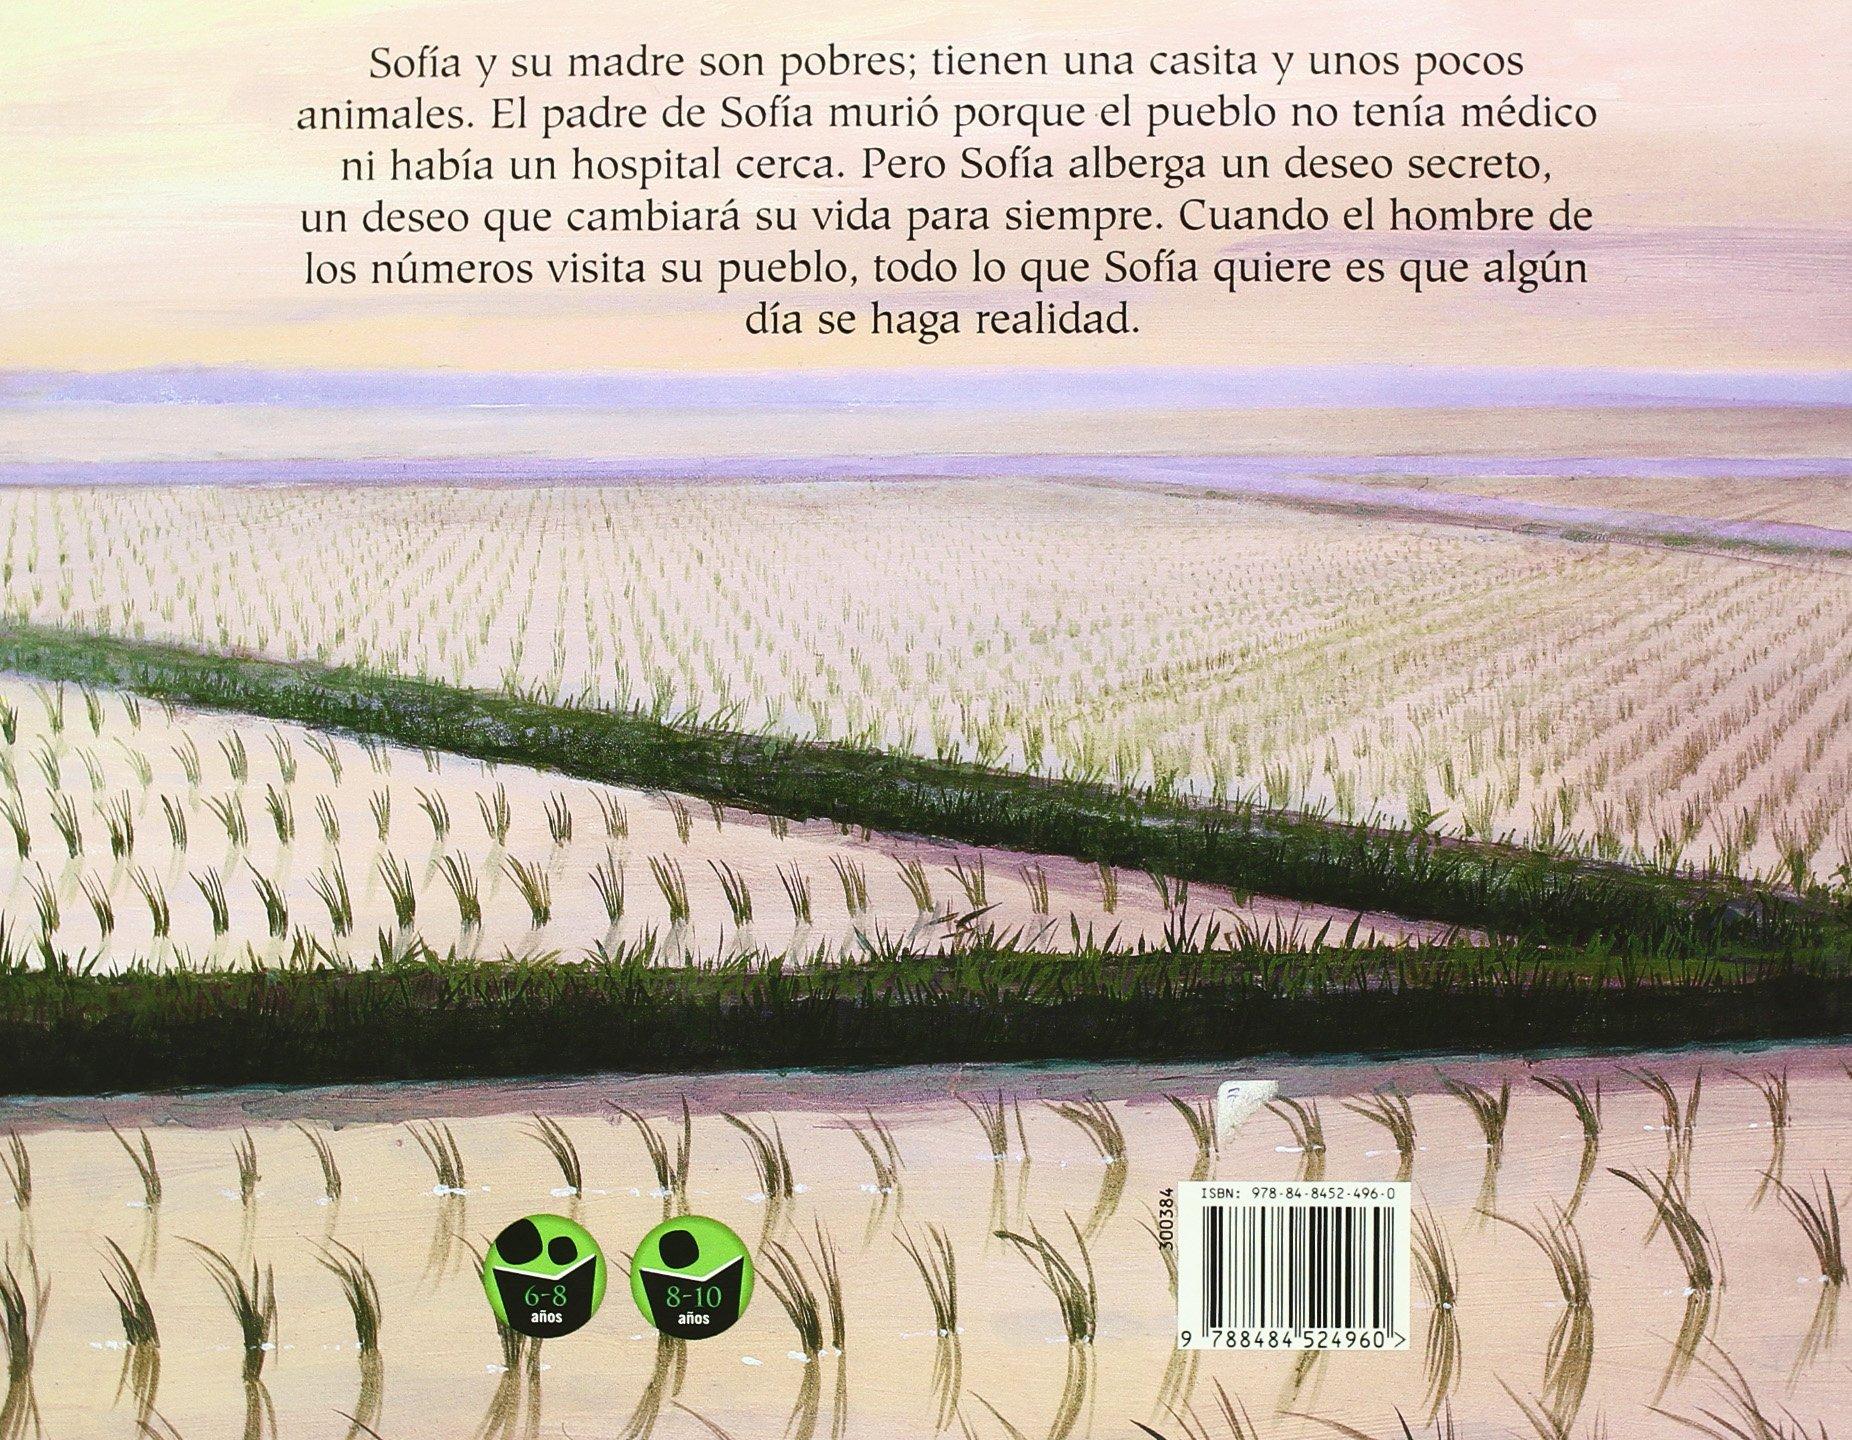 Las zapatillas deportivas de Sofia / Running Shoes (Spanish Edition): Frederick Lipp, Jason Gaillard: 9788484524960: Amazon.com: Books